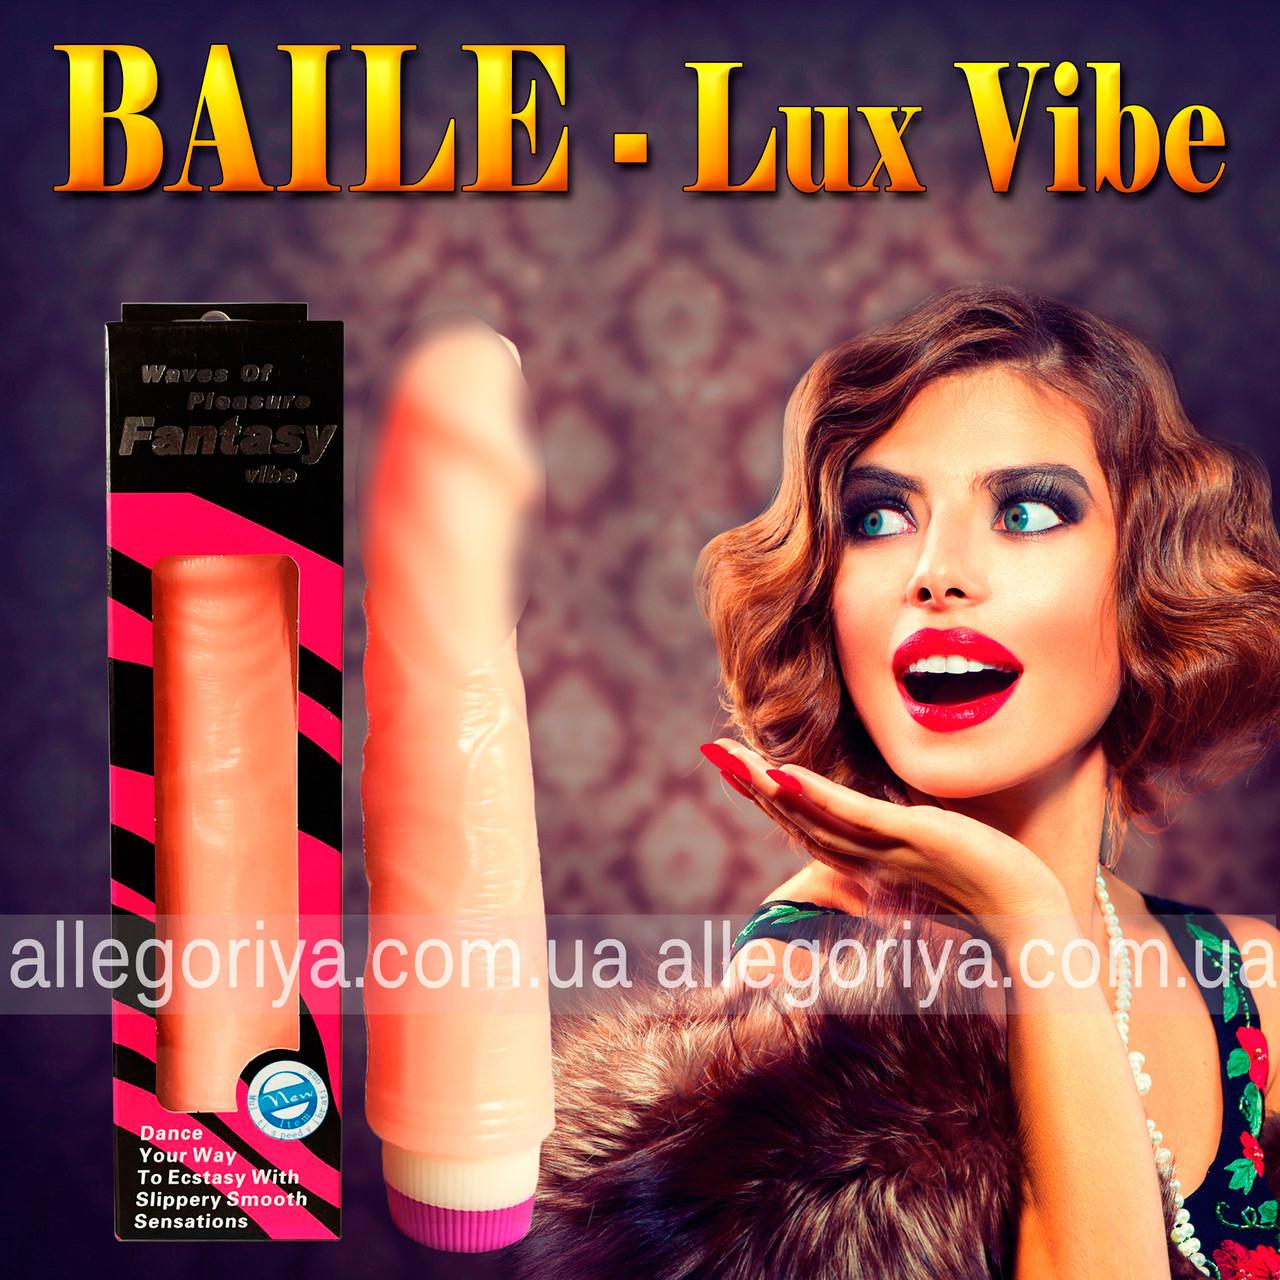 Секс игрушка Вибратор Lux Vibe Гигант | Фаллоимитатор Baile от Сексшоп